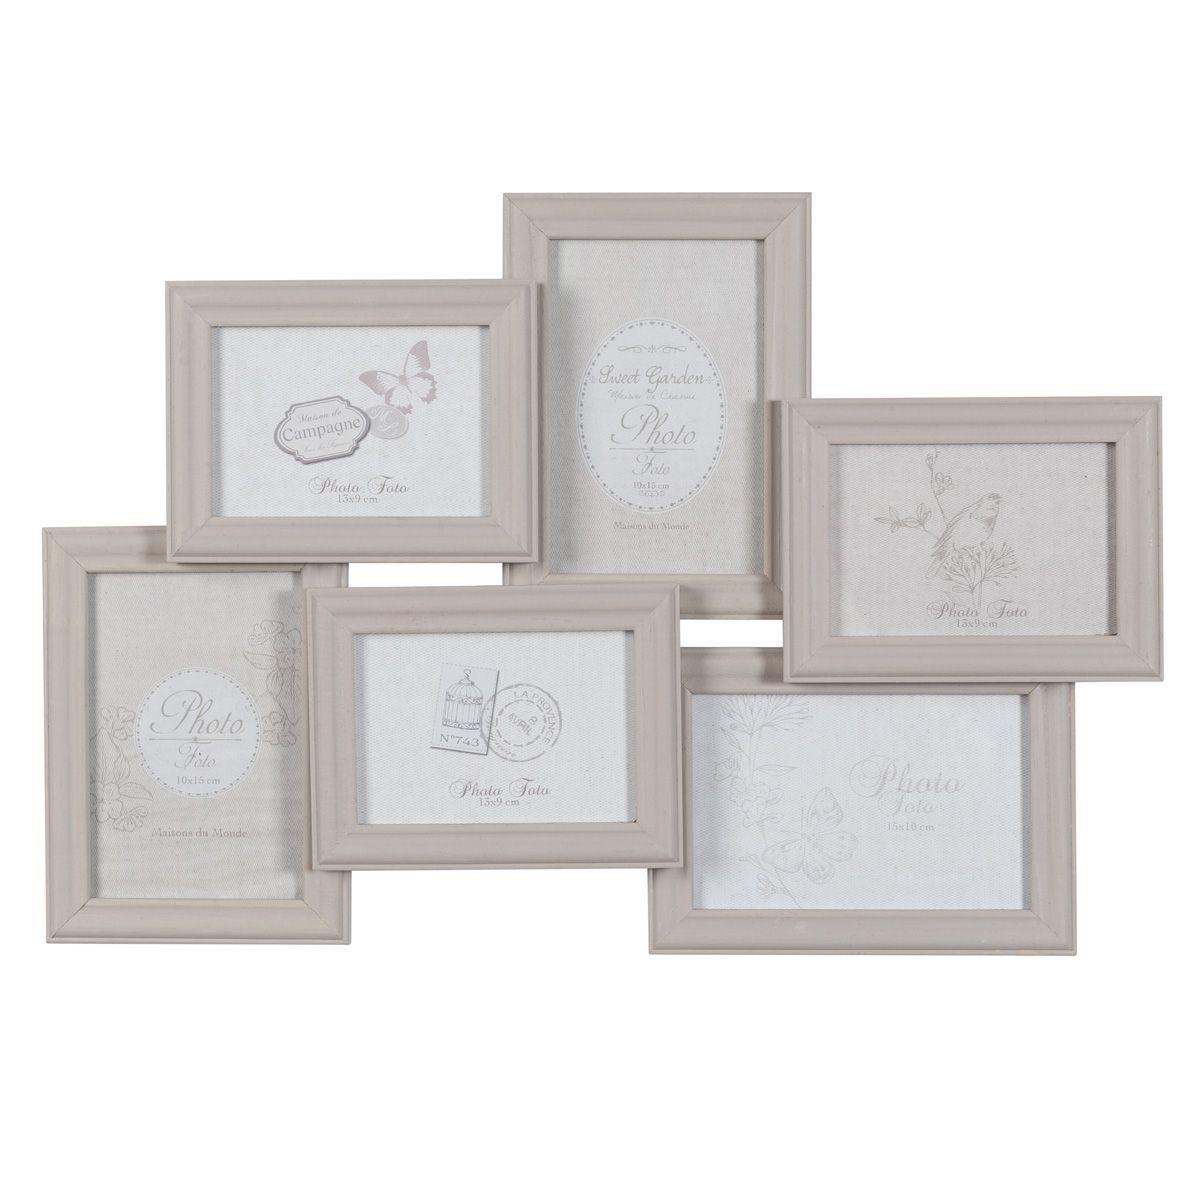 Marco para 6 fotos de madera beis | marcos multifotos | Pinterest ...